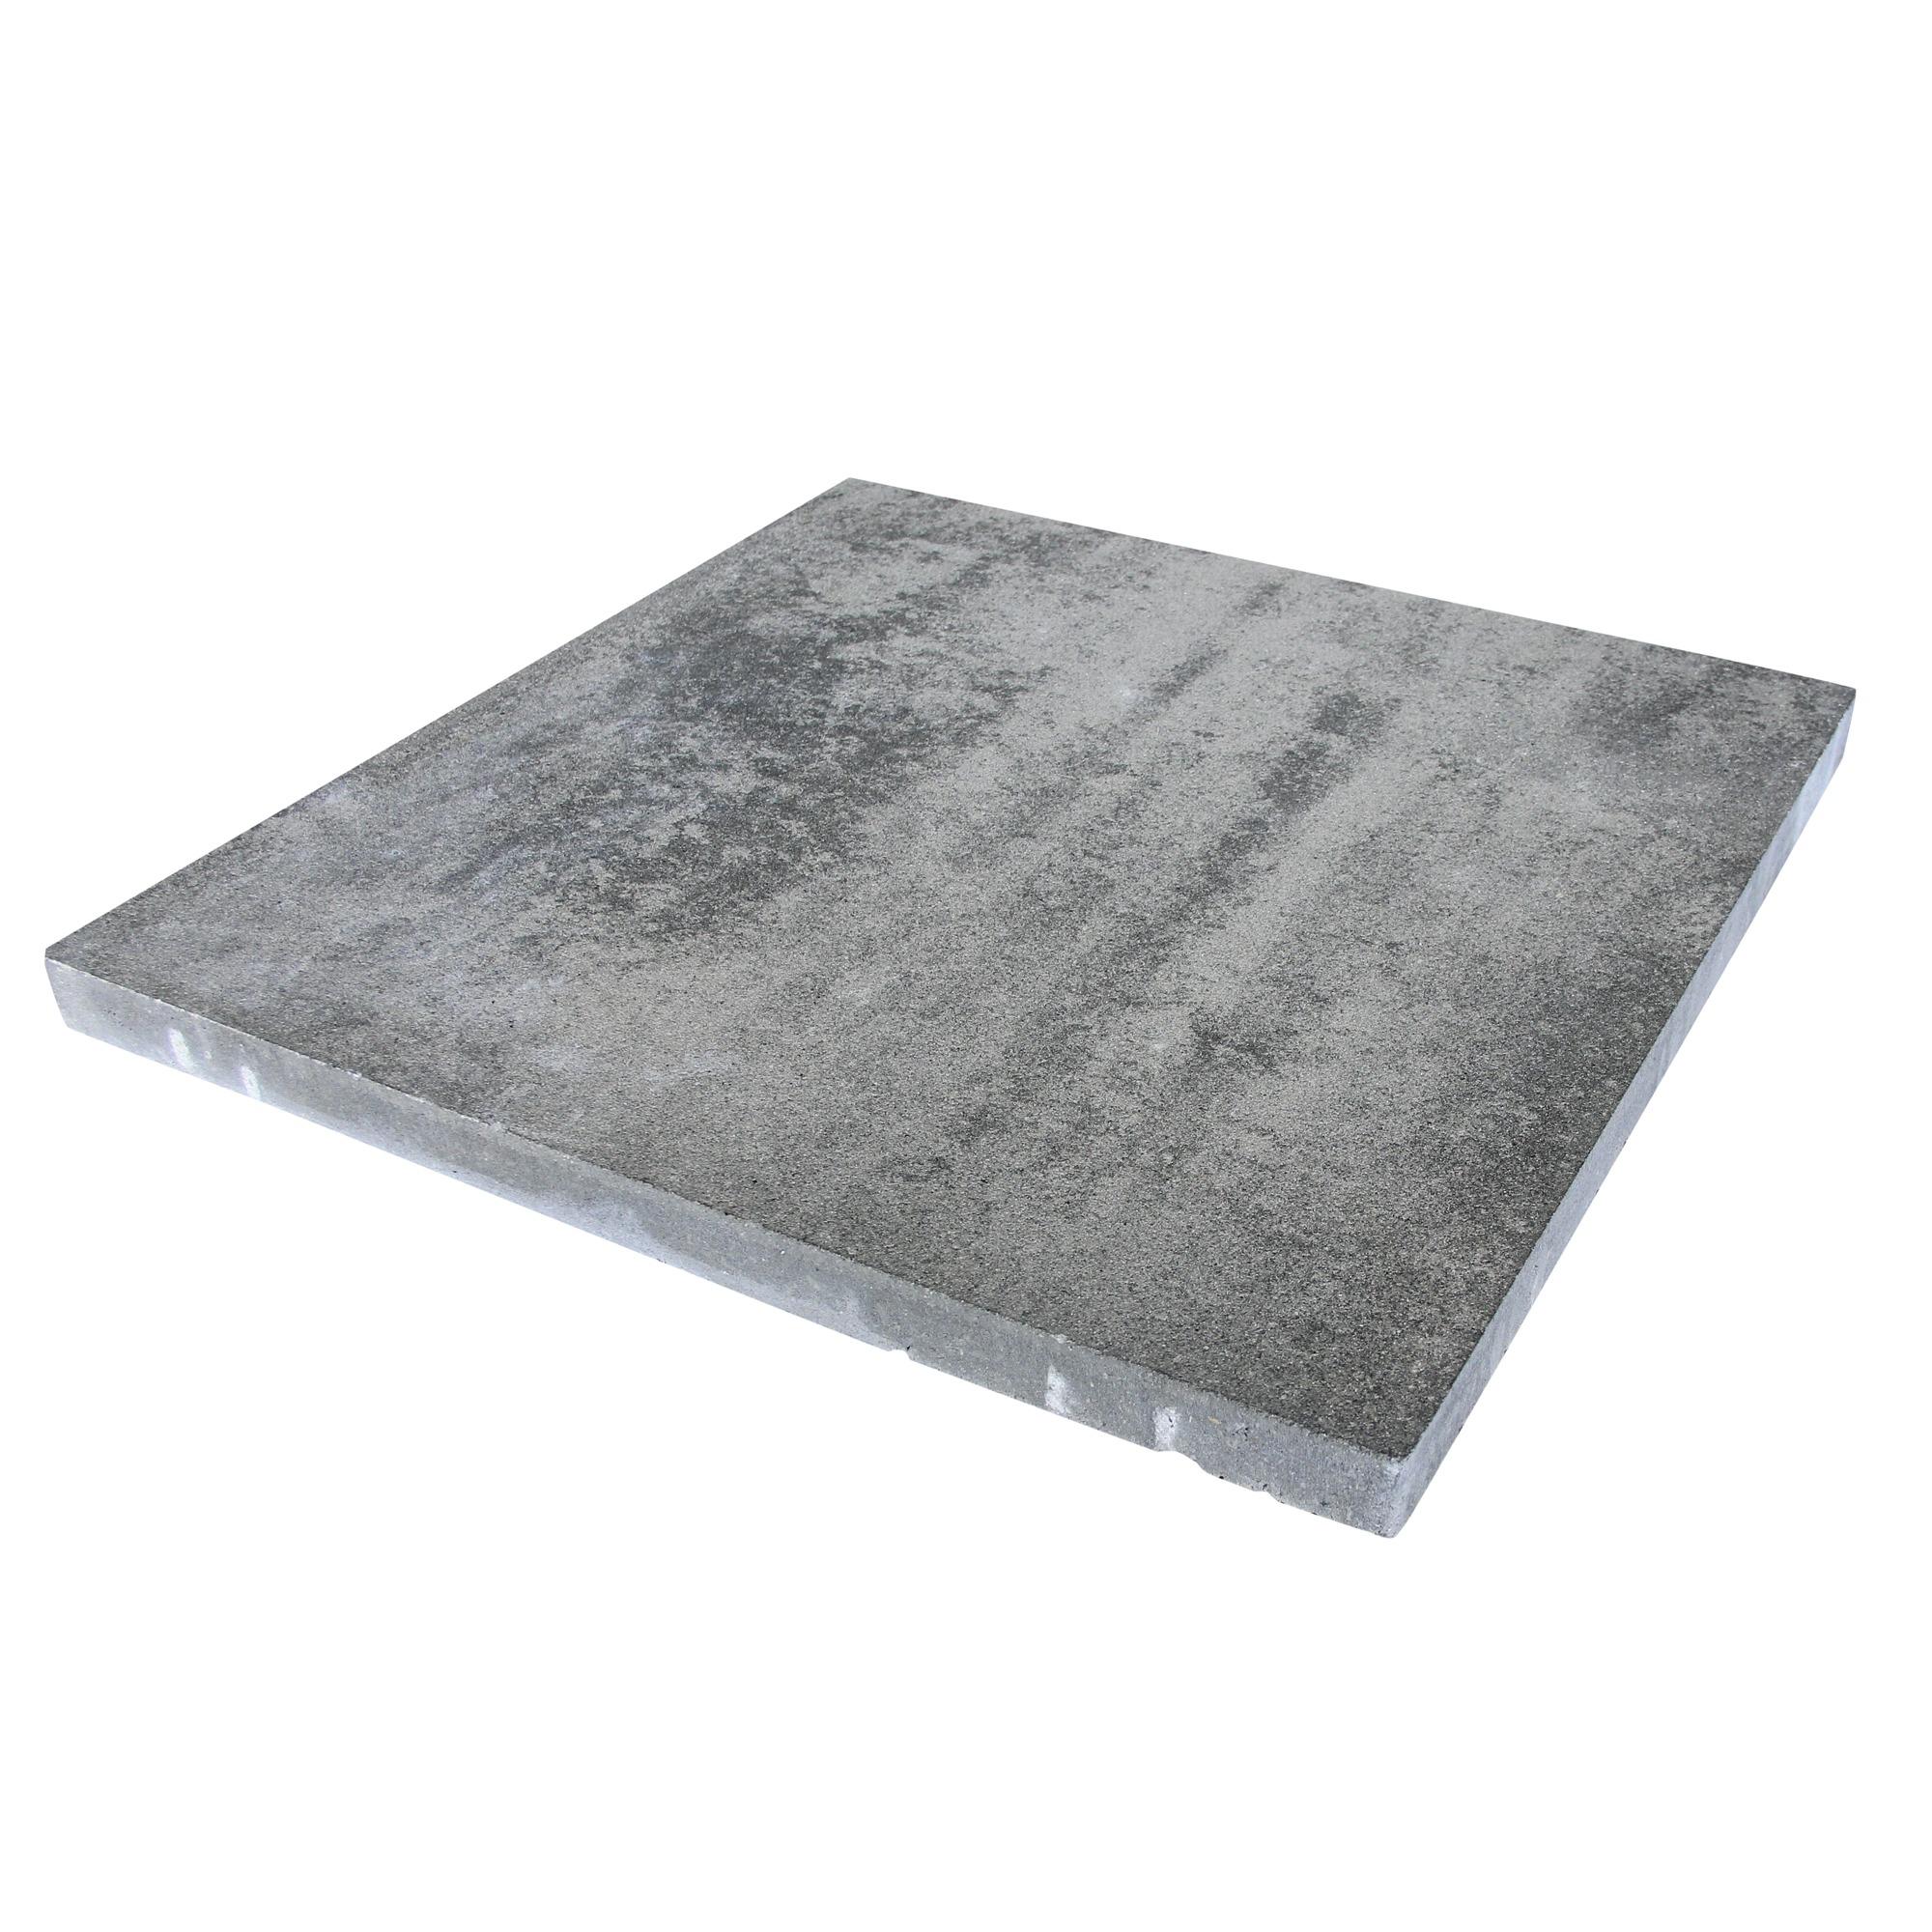 Terrastegel Beton Vegas Grijs 60x60 cm Per Tegel-0,36 m2